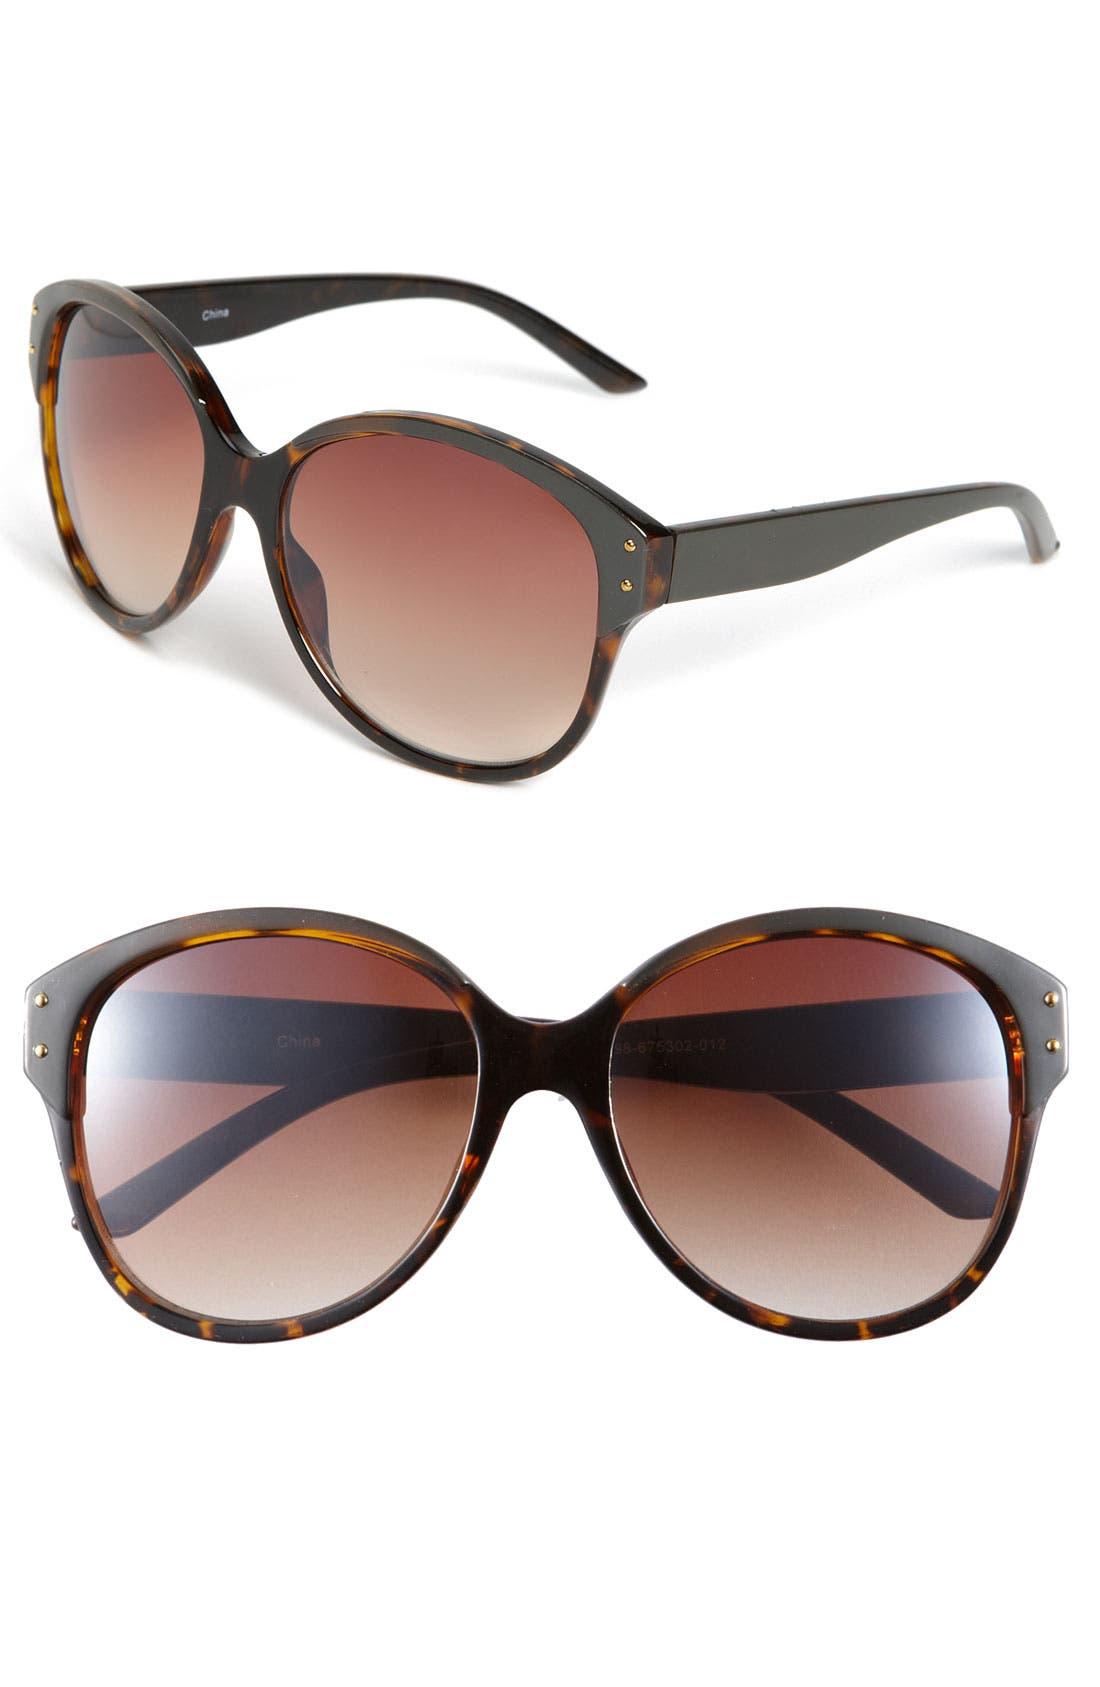 Main Image - Icon Eyewear 'Theresa' Sunglasses